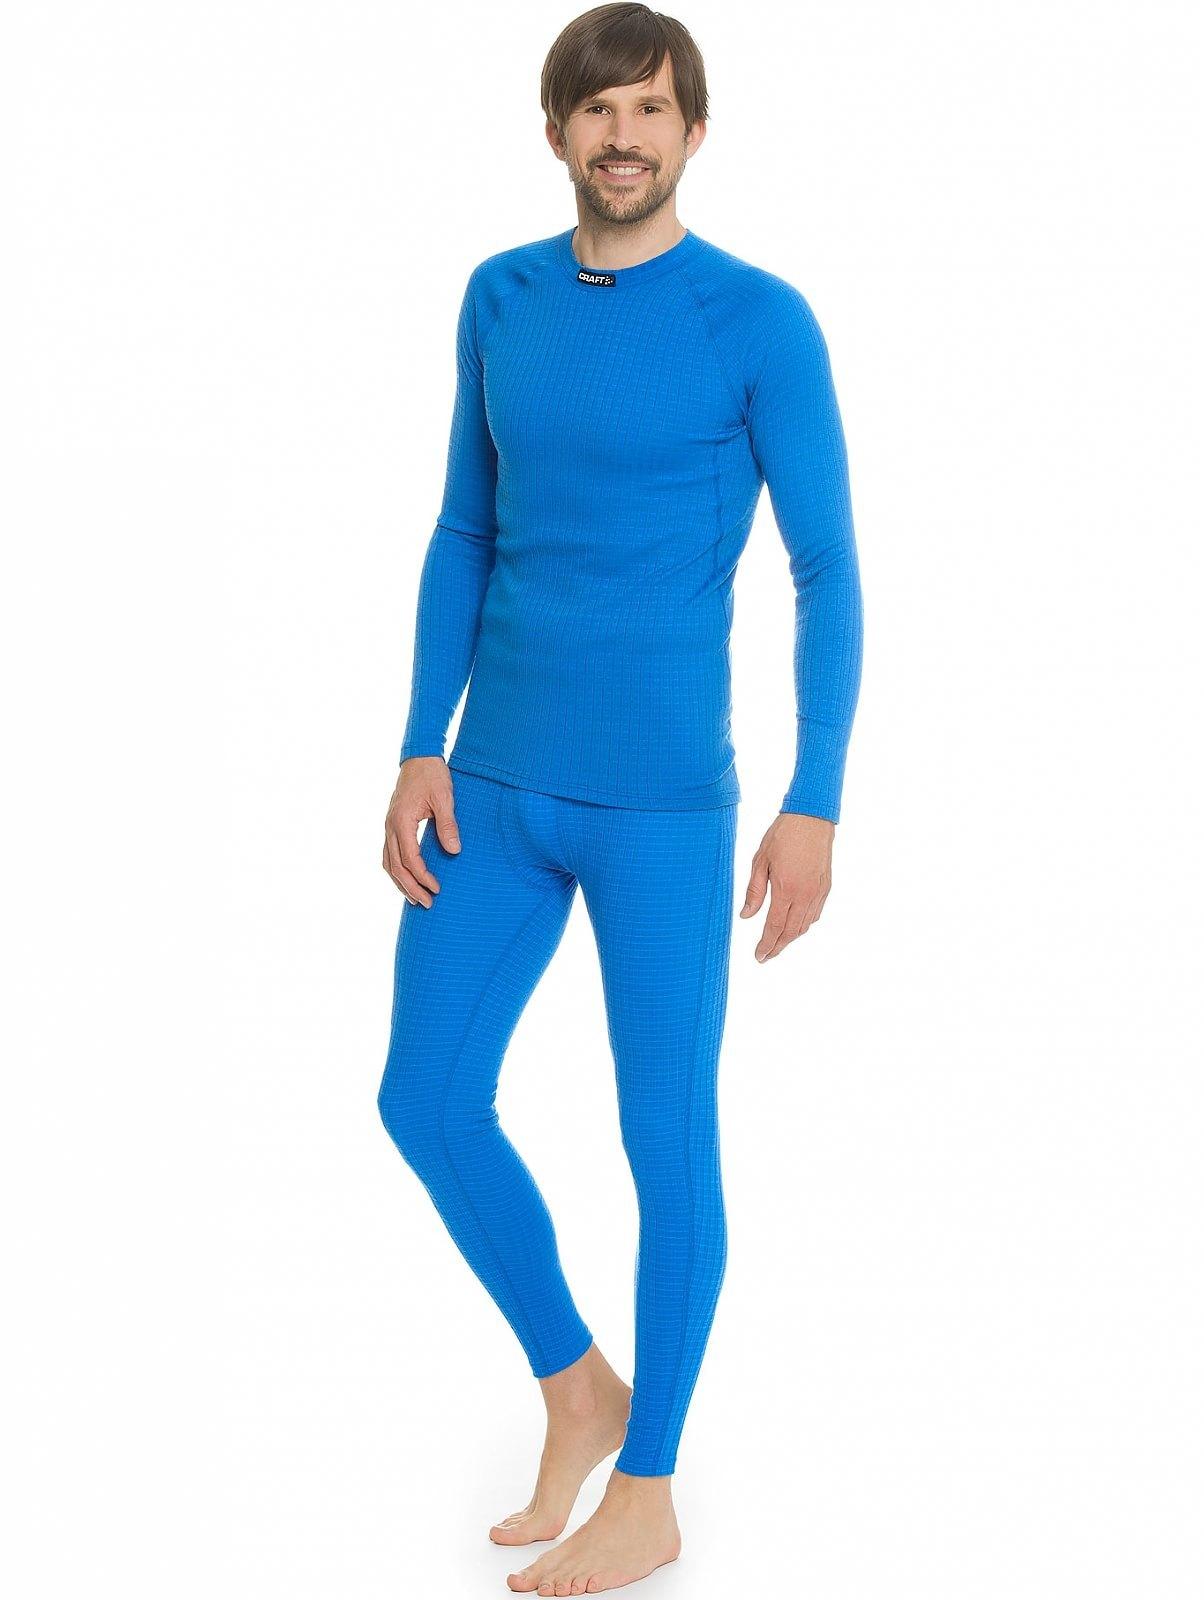 Мужская терморубашка крафт Warm Wool Black blue (1903726-1336)